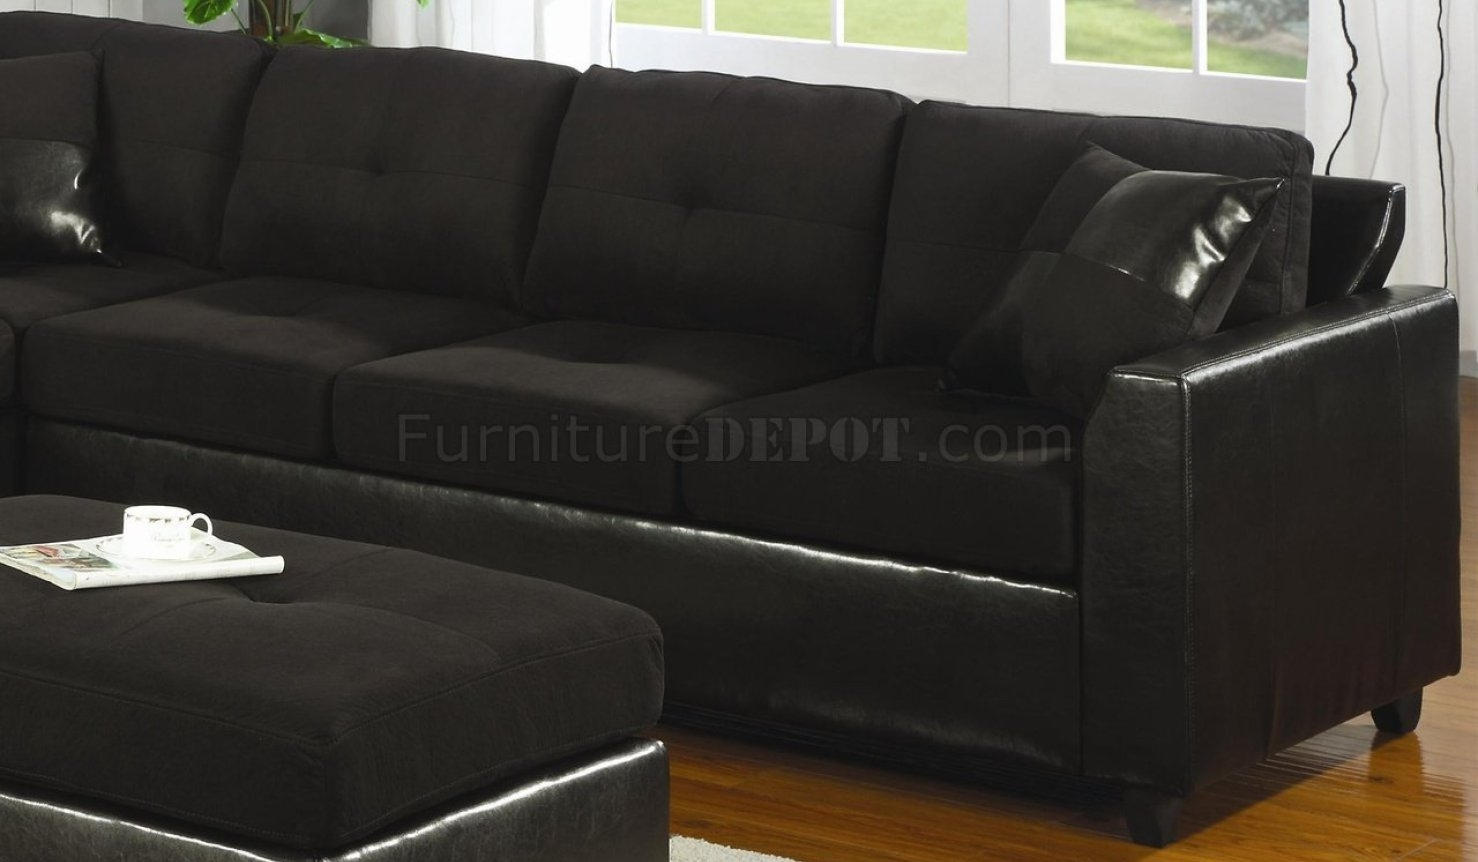 cheap sectional sofas phoenix asian living room sofa table ideas explore 10 of photos